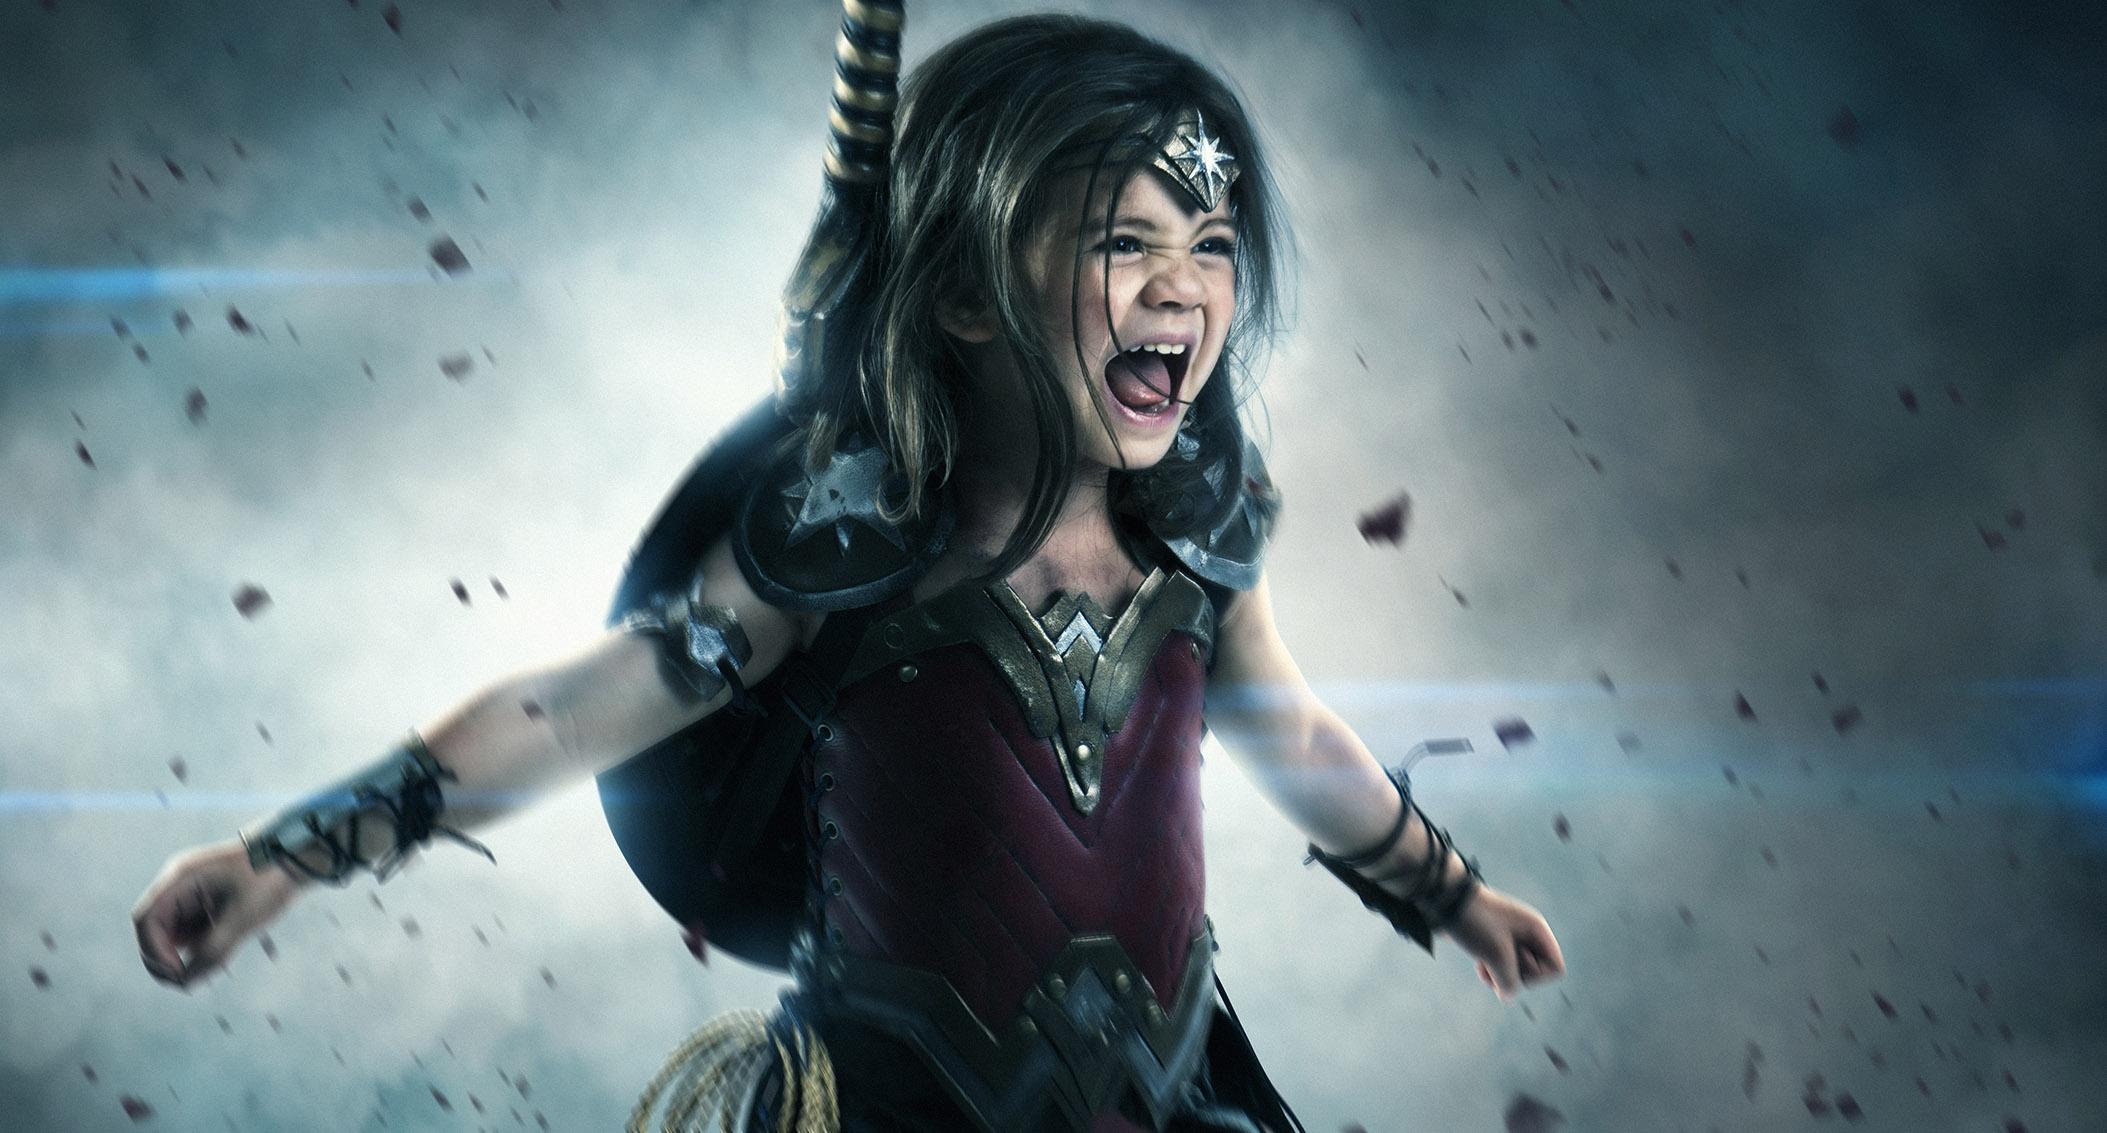 Wonder Woman Cute Girl Hd Cute 4k Wallpapers Images